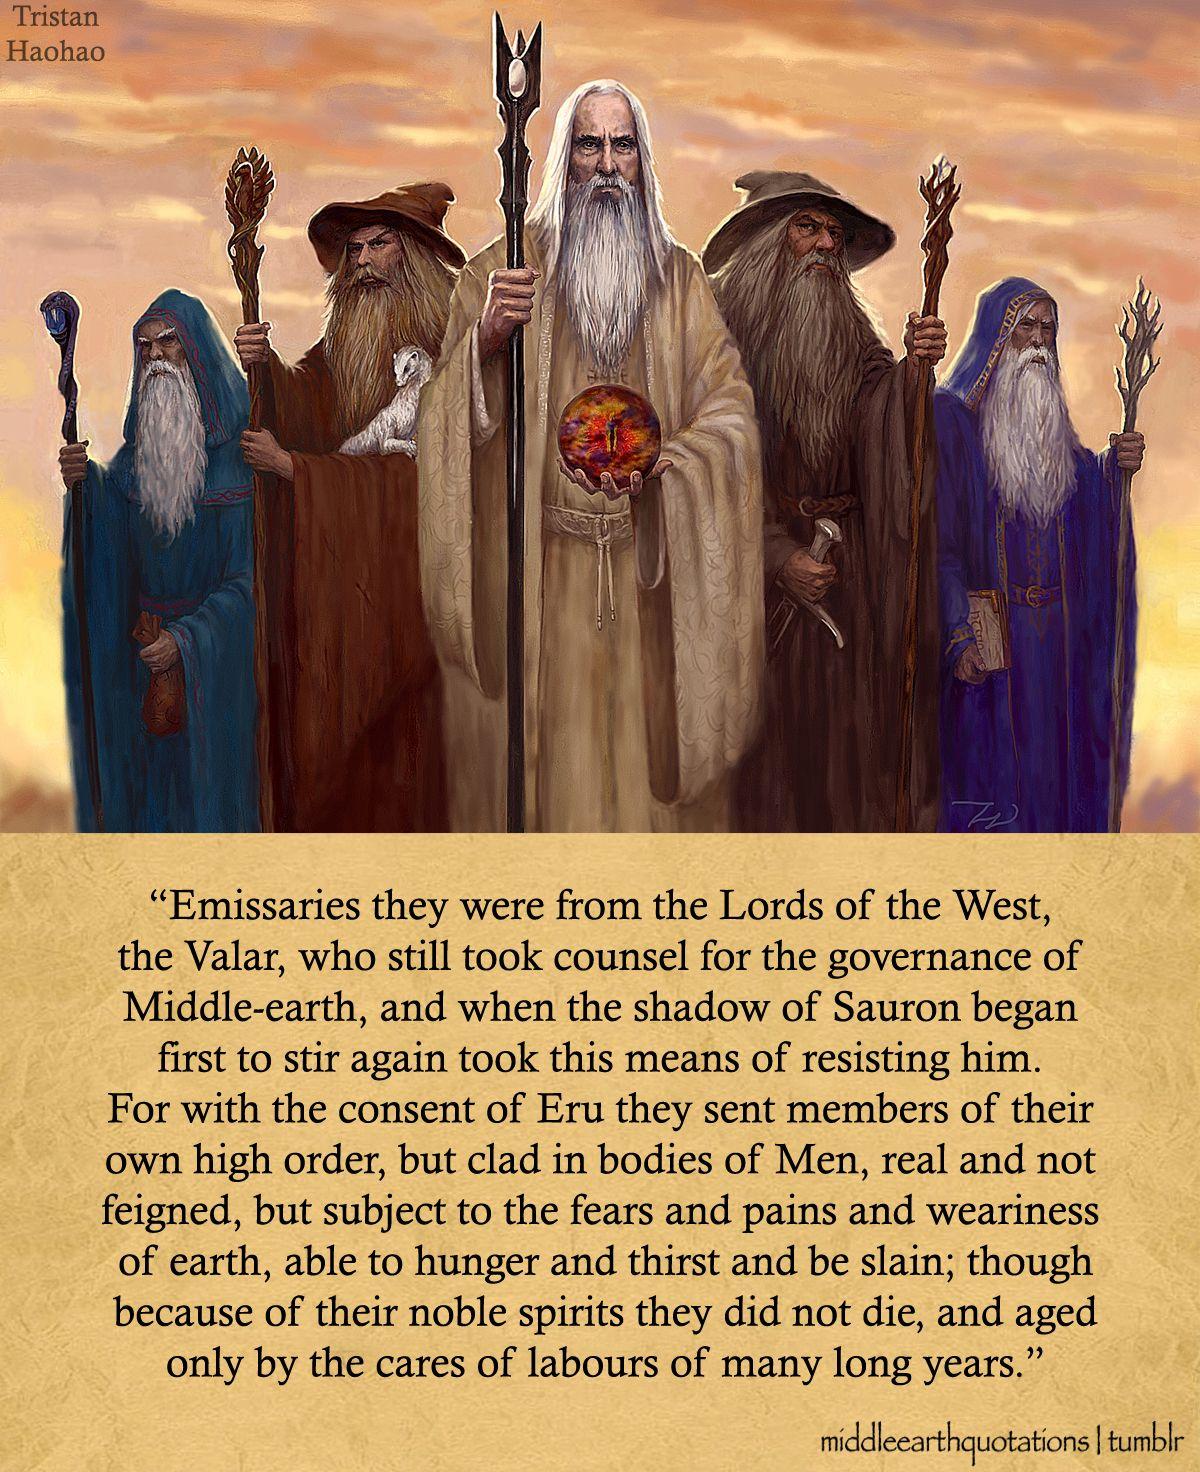 The Istari: Curumo (Saruman the White), Olórin (Gandalf the Grey), Aiwendil (Radagast the Brown), Alatar and Pallando (The Blue Wizards)